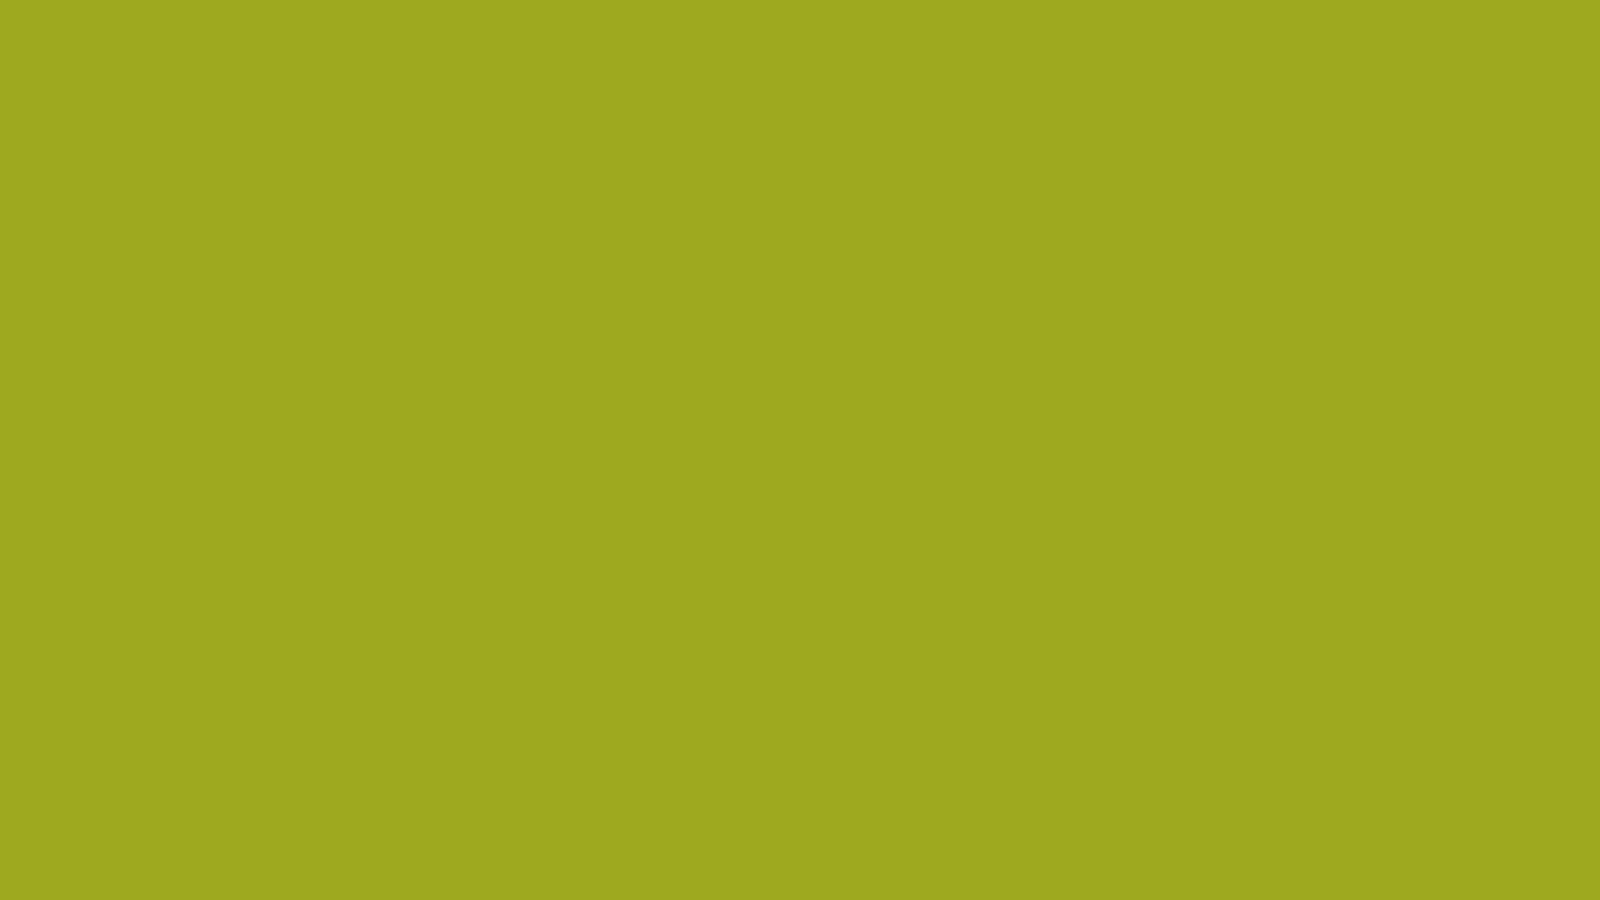 1600x900 Citron Solid Color Background